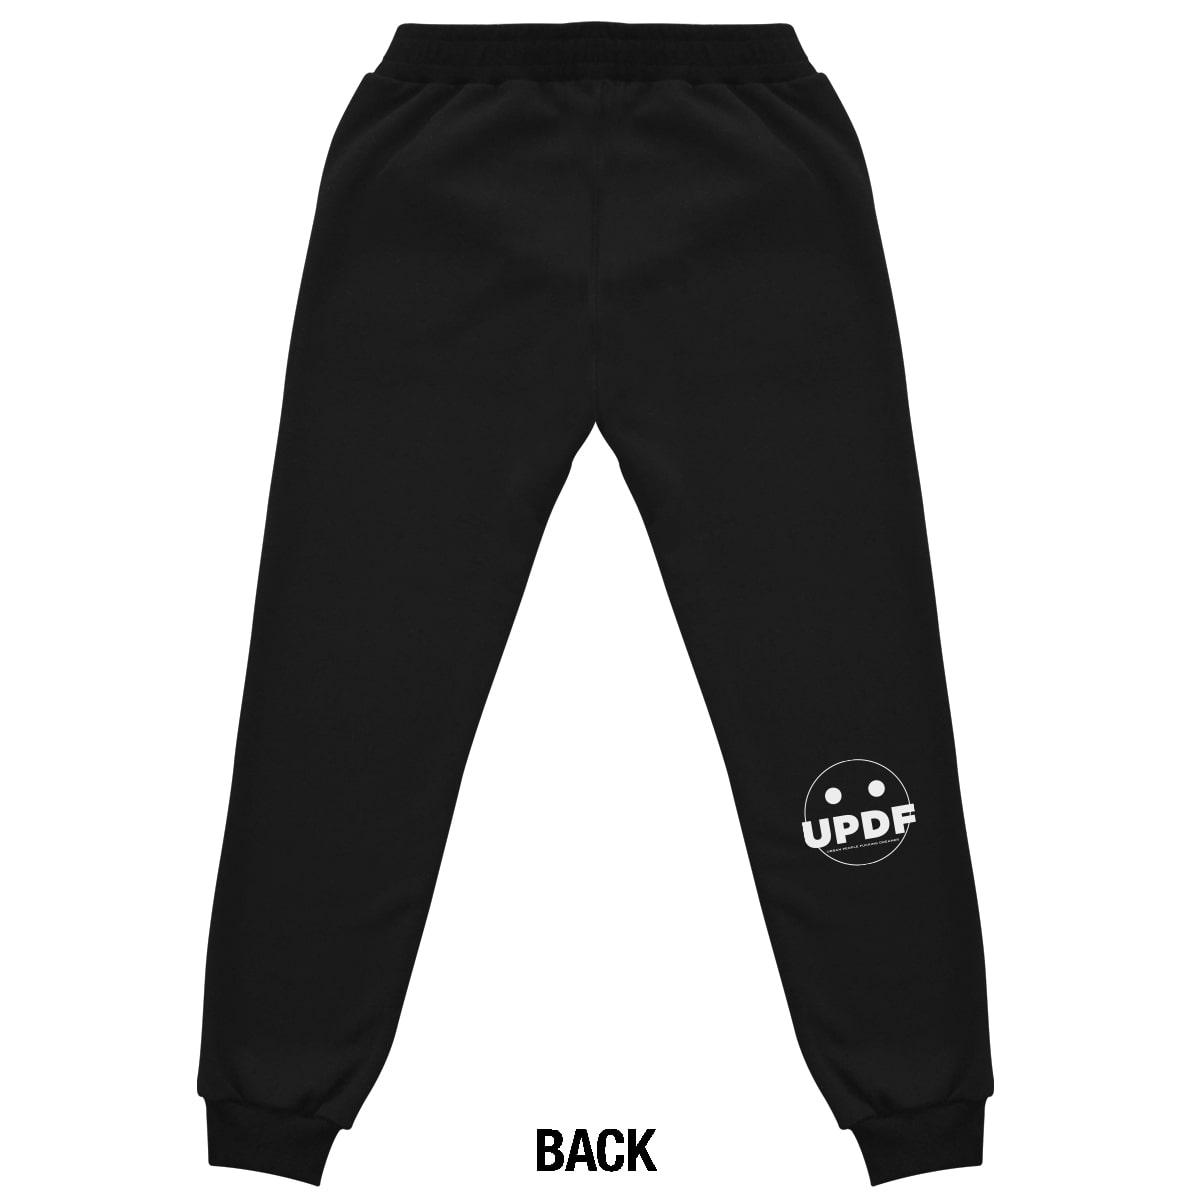 Black logo Pant Updf retro